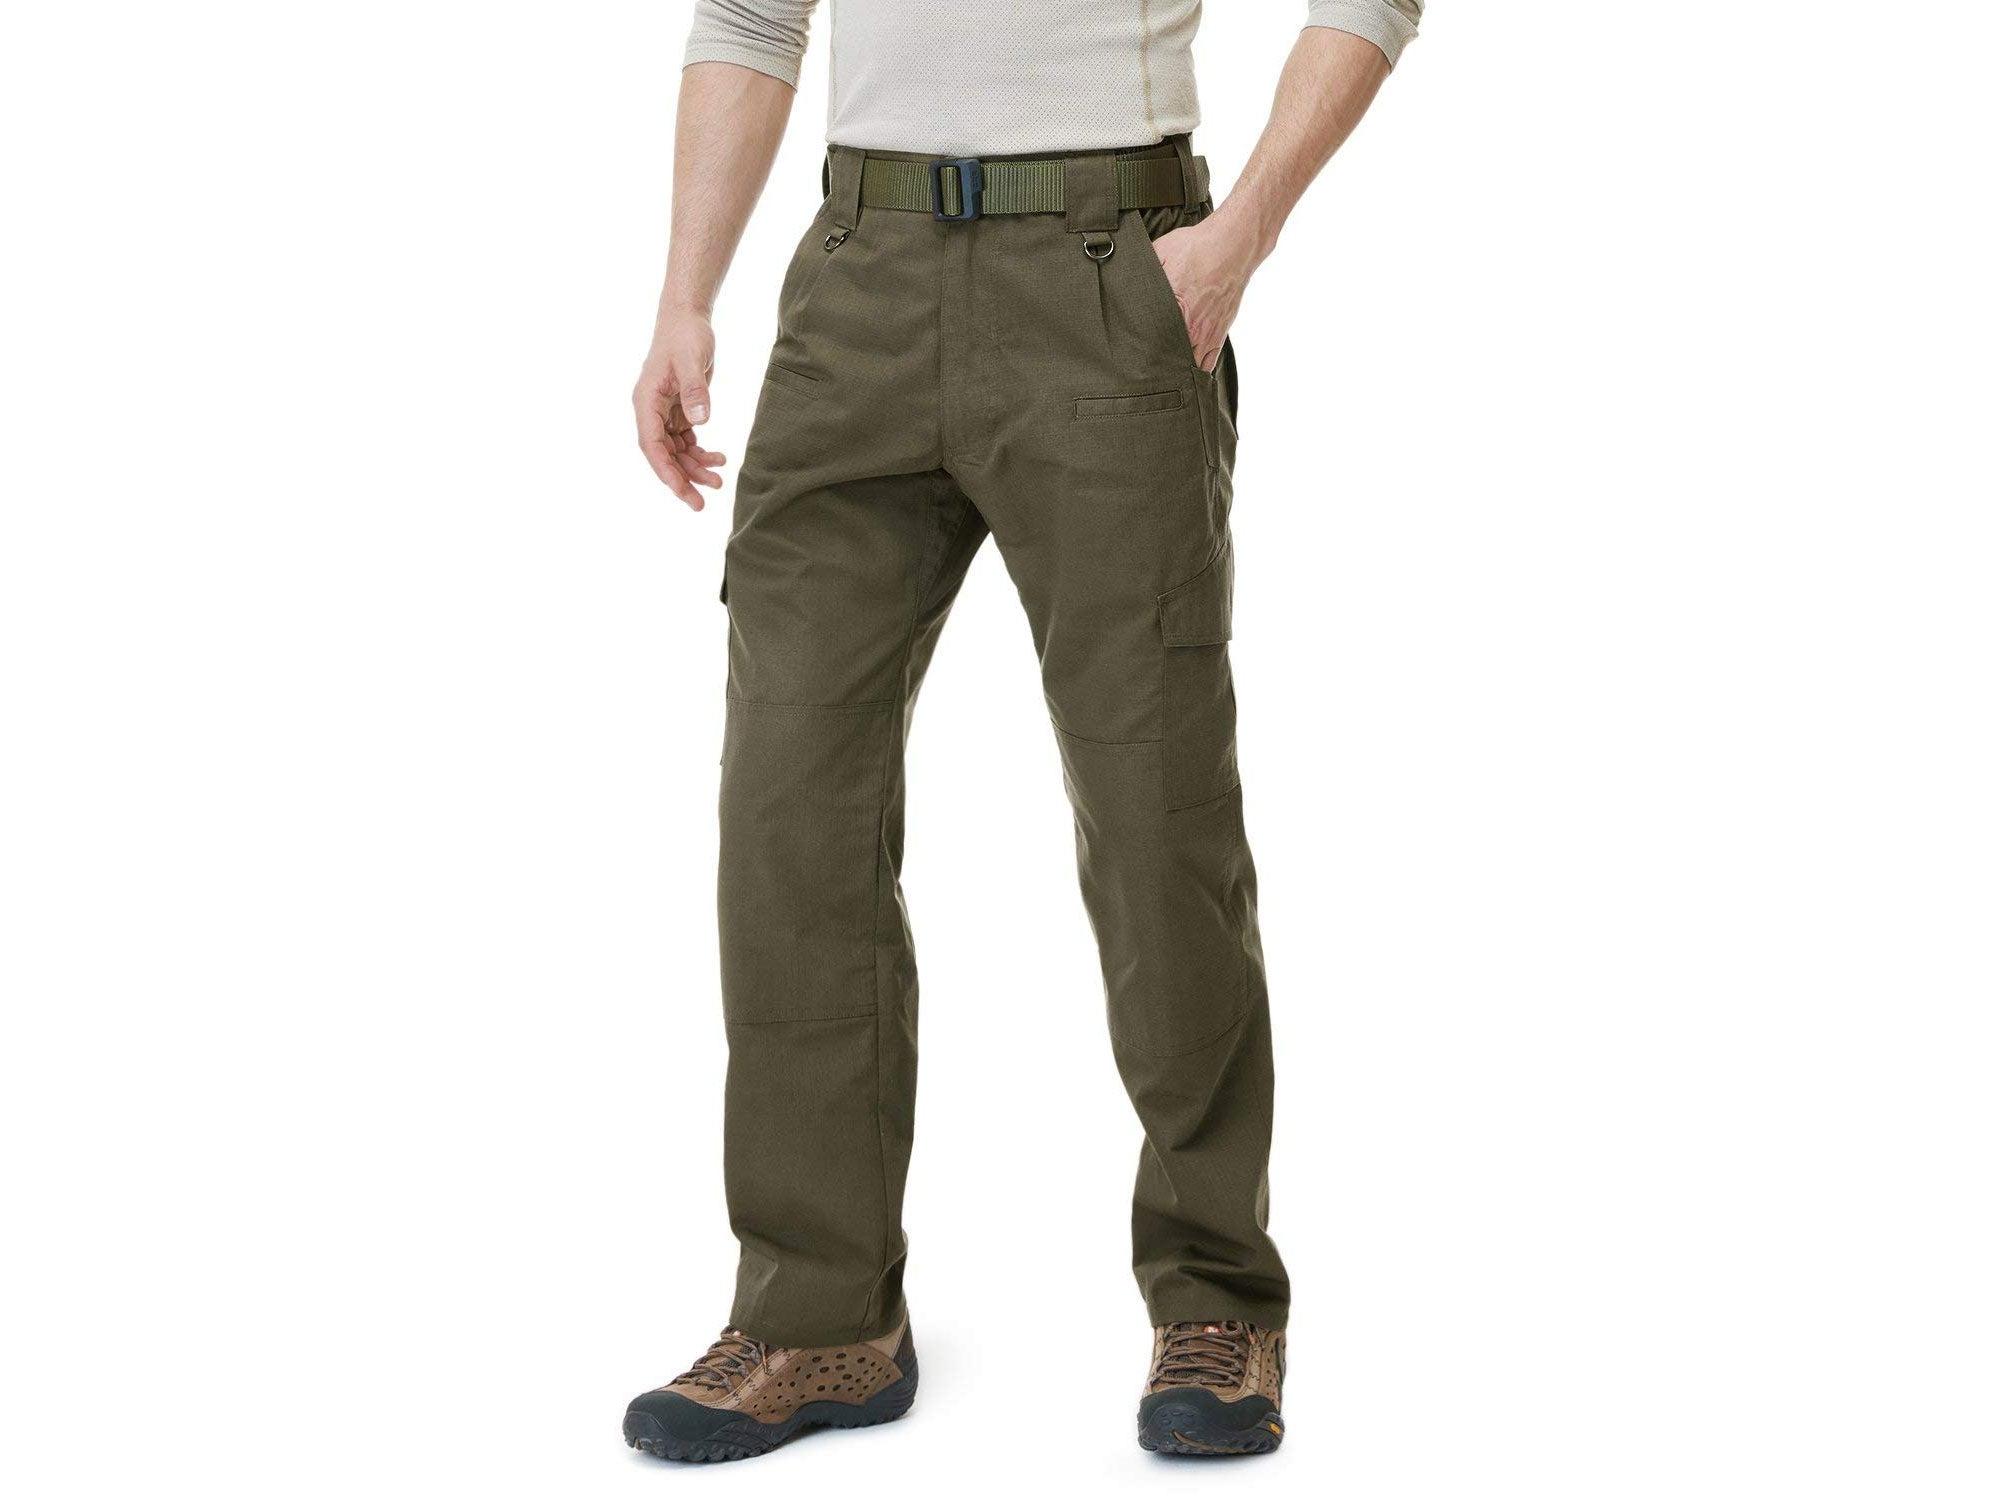 Man wearing army green tactical pants